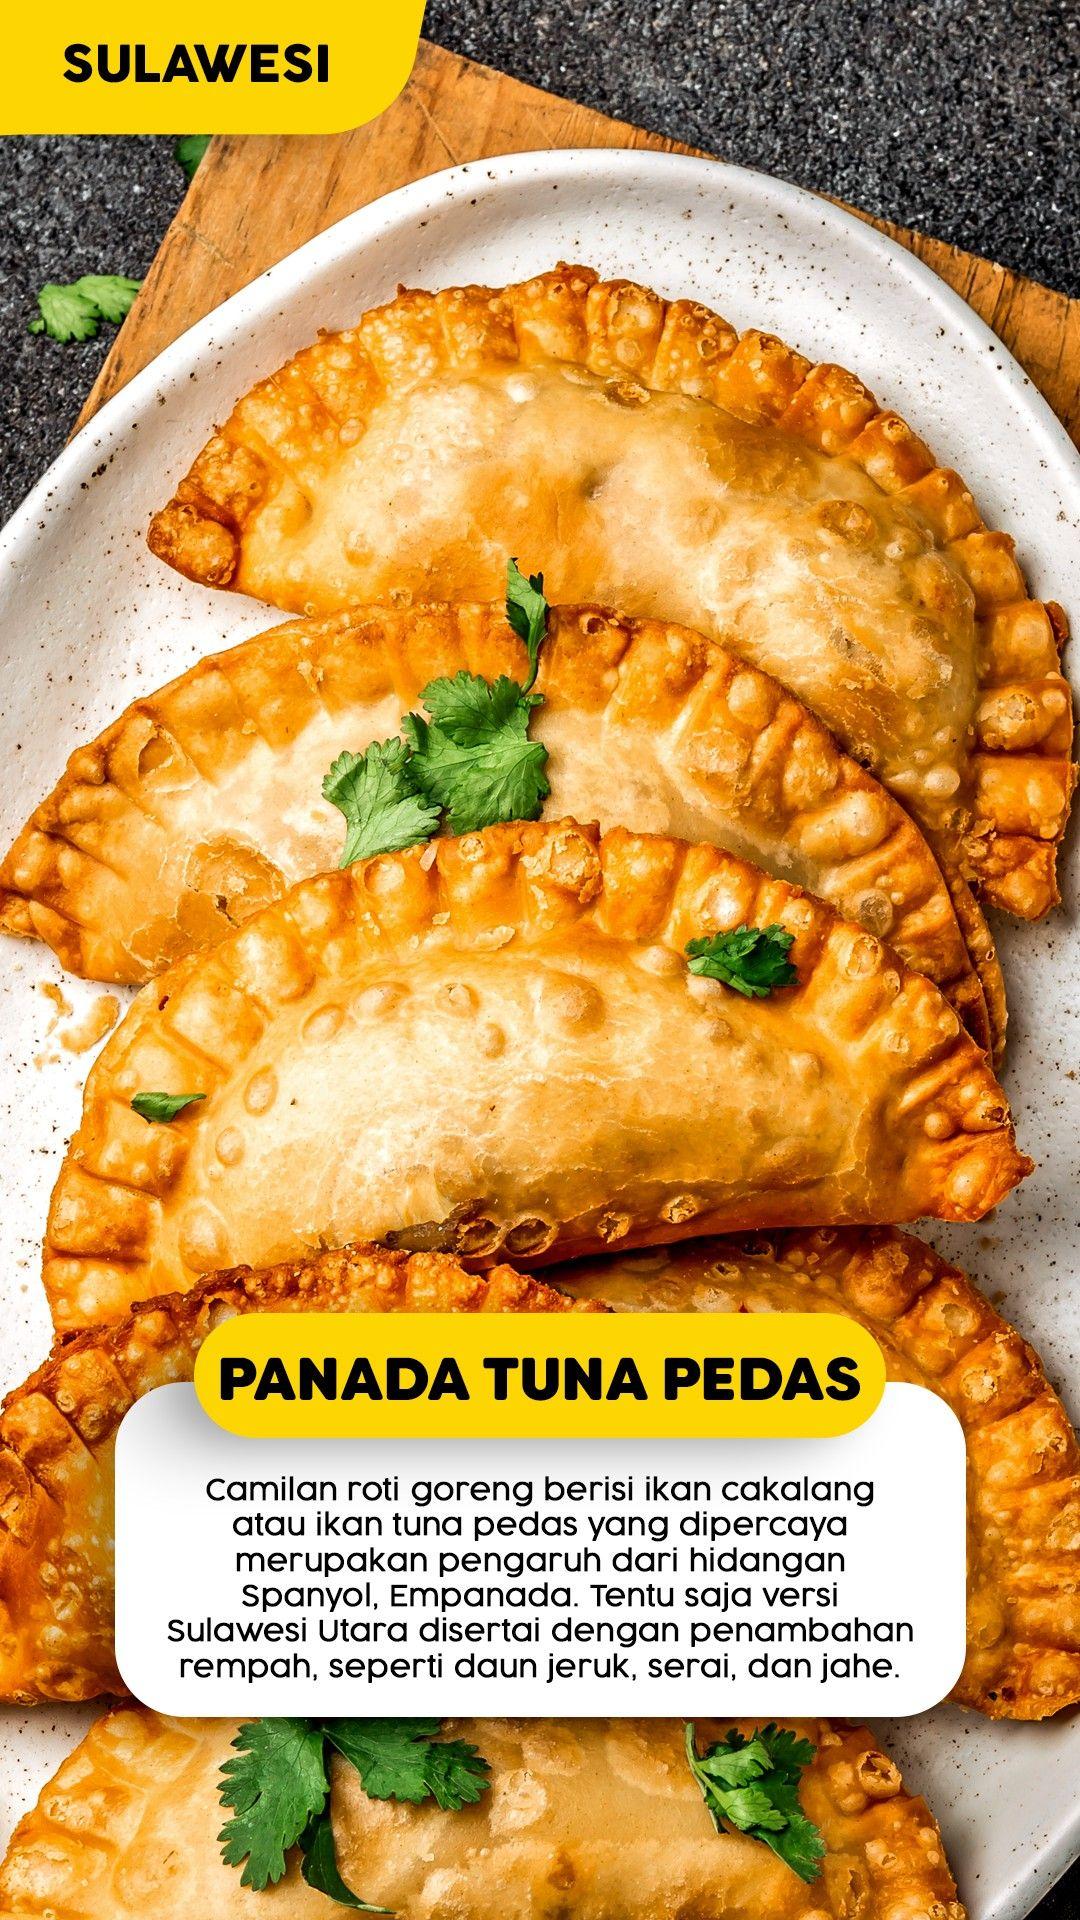 Resep Panada Tuna Pedas Makanan Empanada Camilan